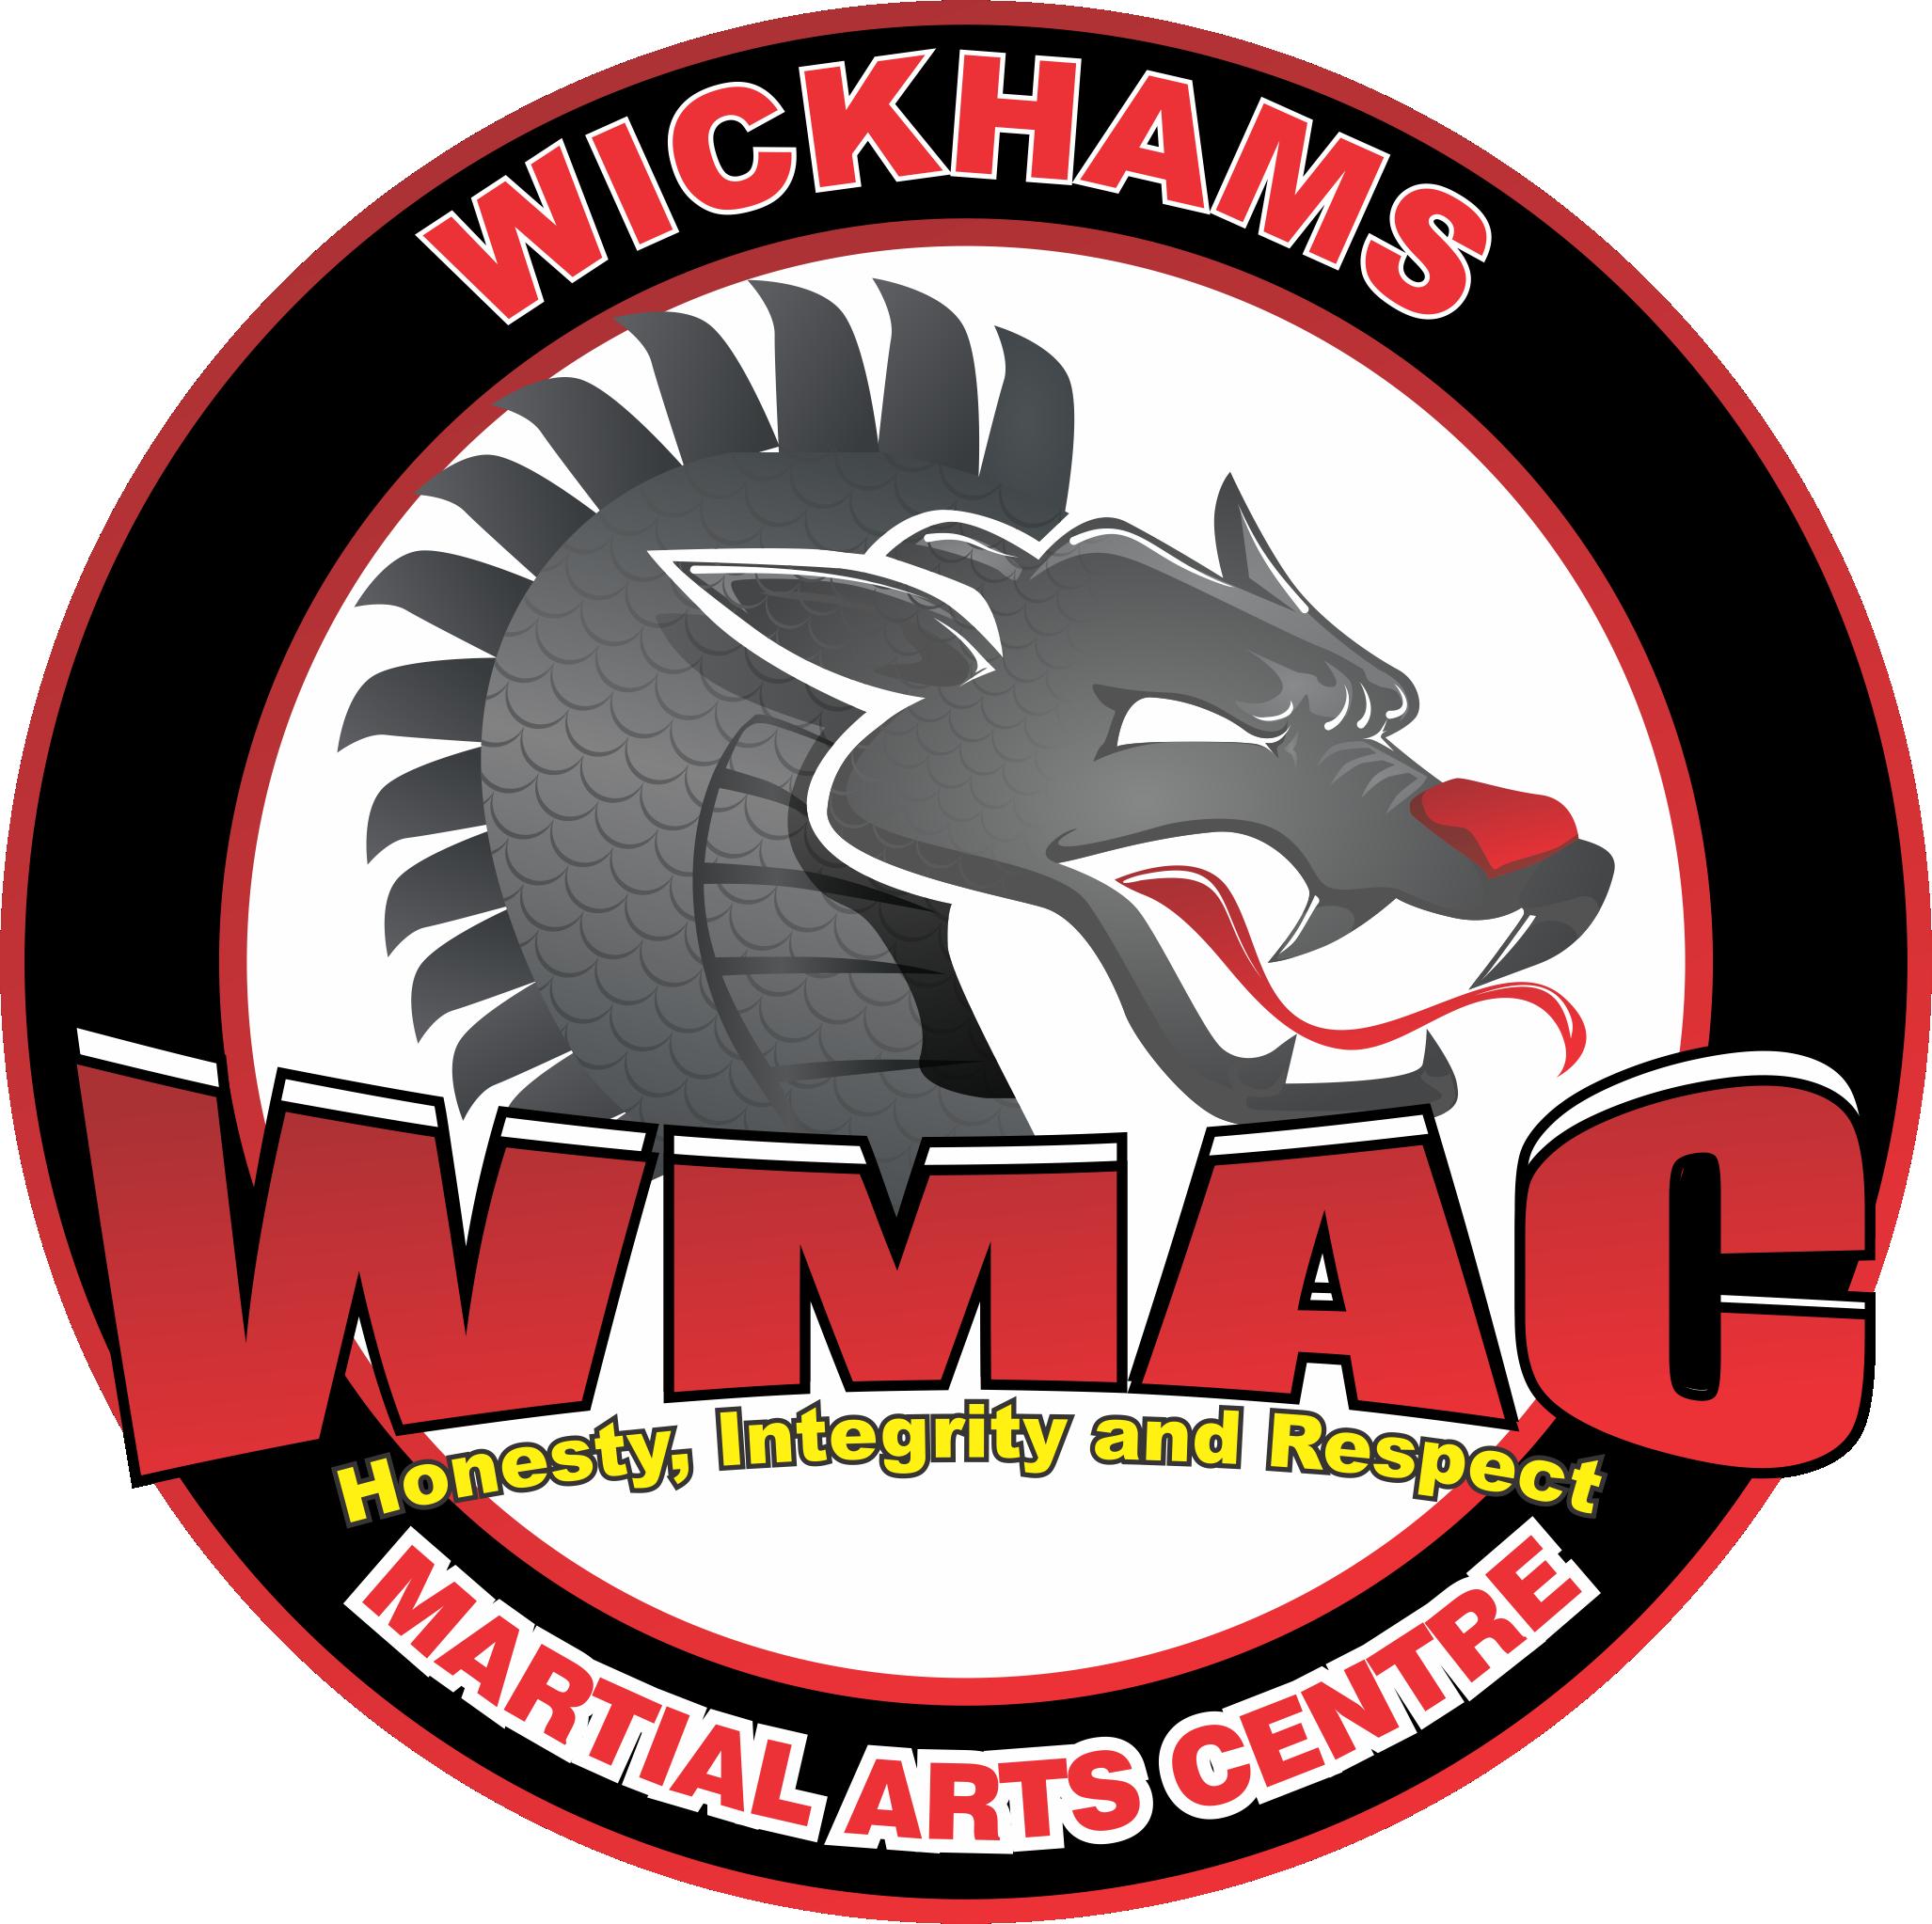 Wickhams Martial Arts Centre - Echuca, Karate, MMA, Martial Arts